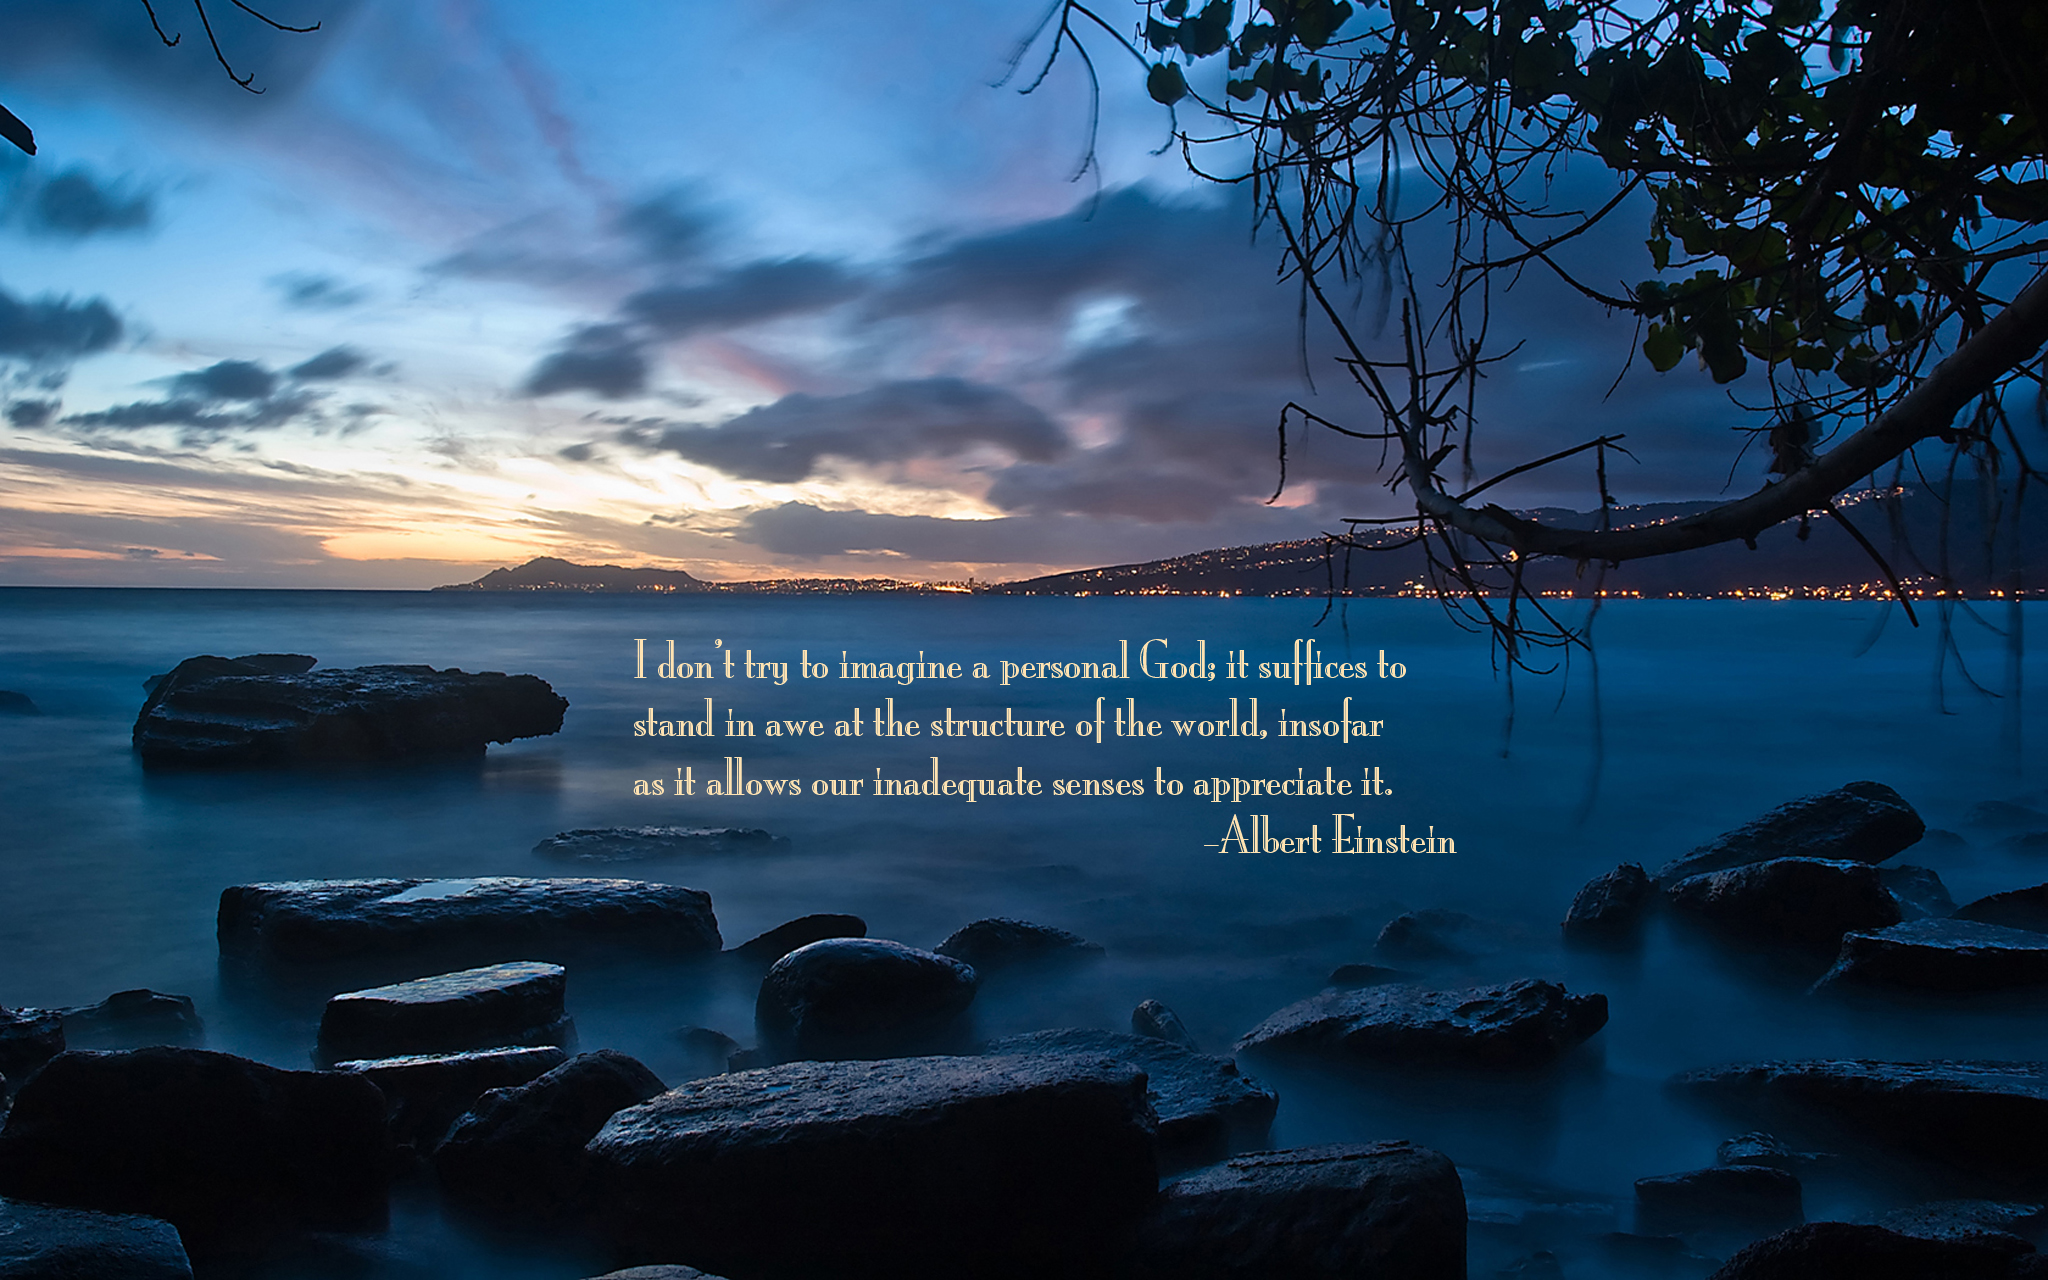 Sunset quote #2